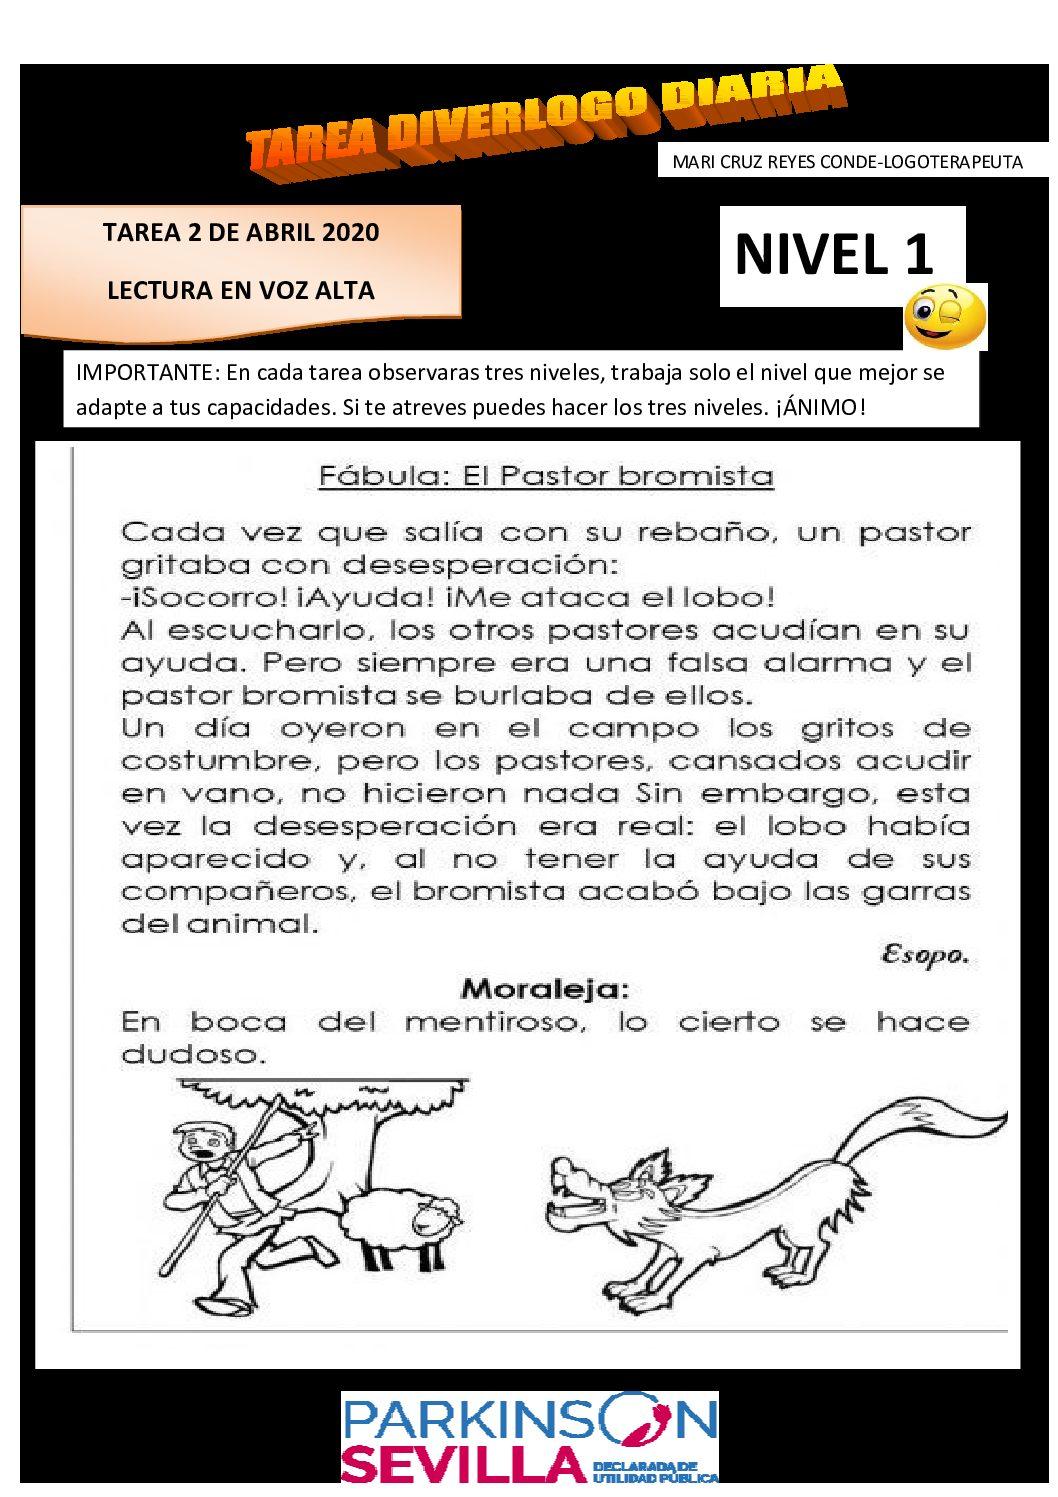 TAREA-3-DE-ABRIL-LOGO-pdf[1]